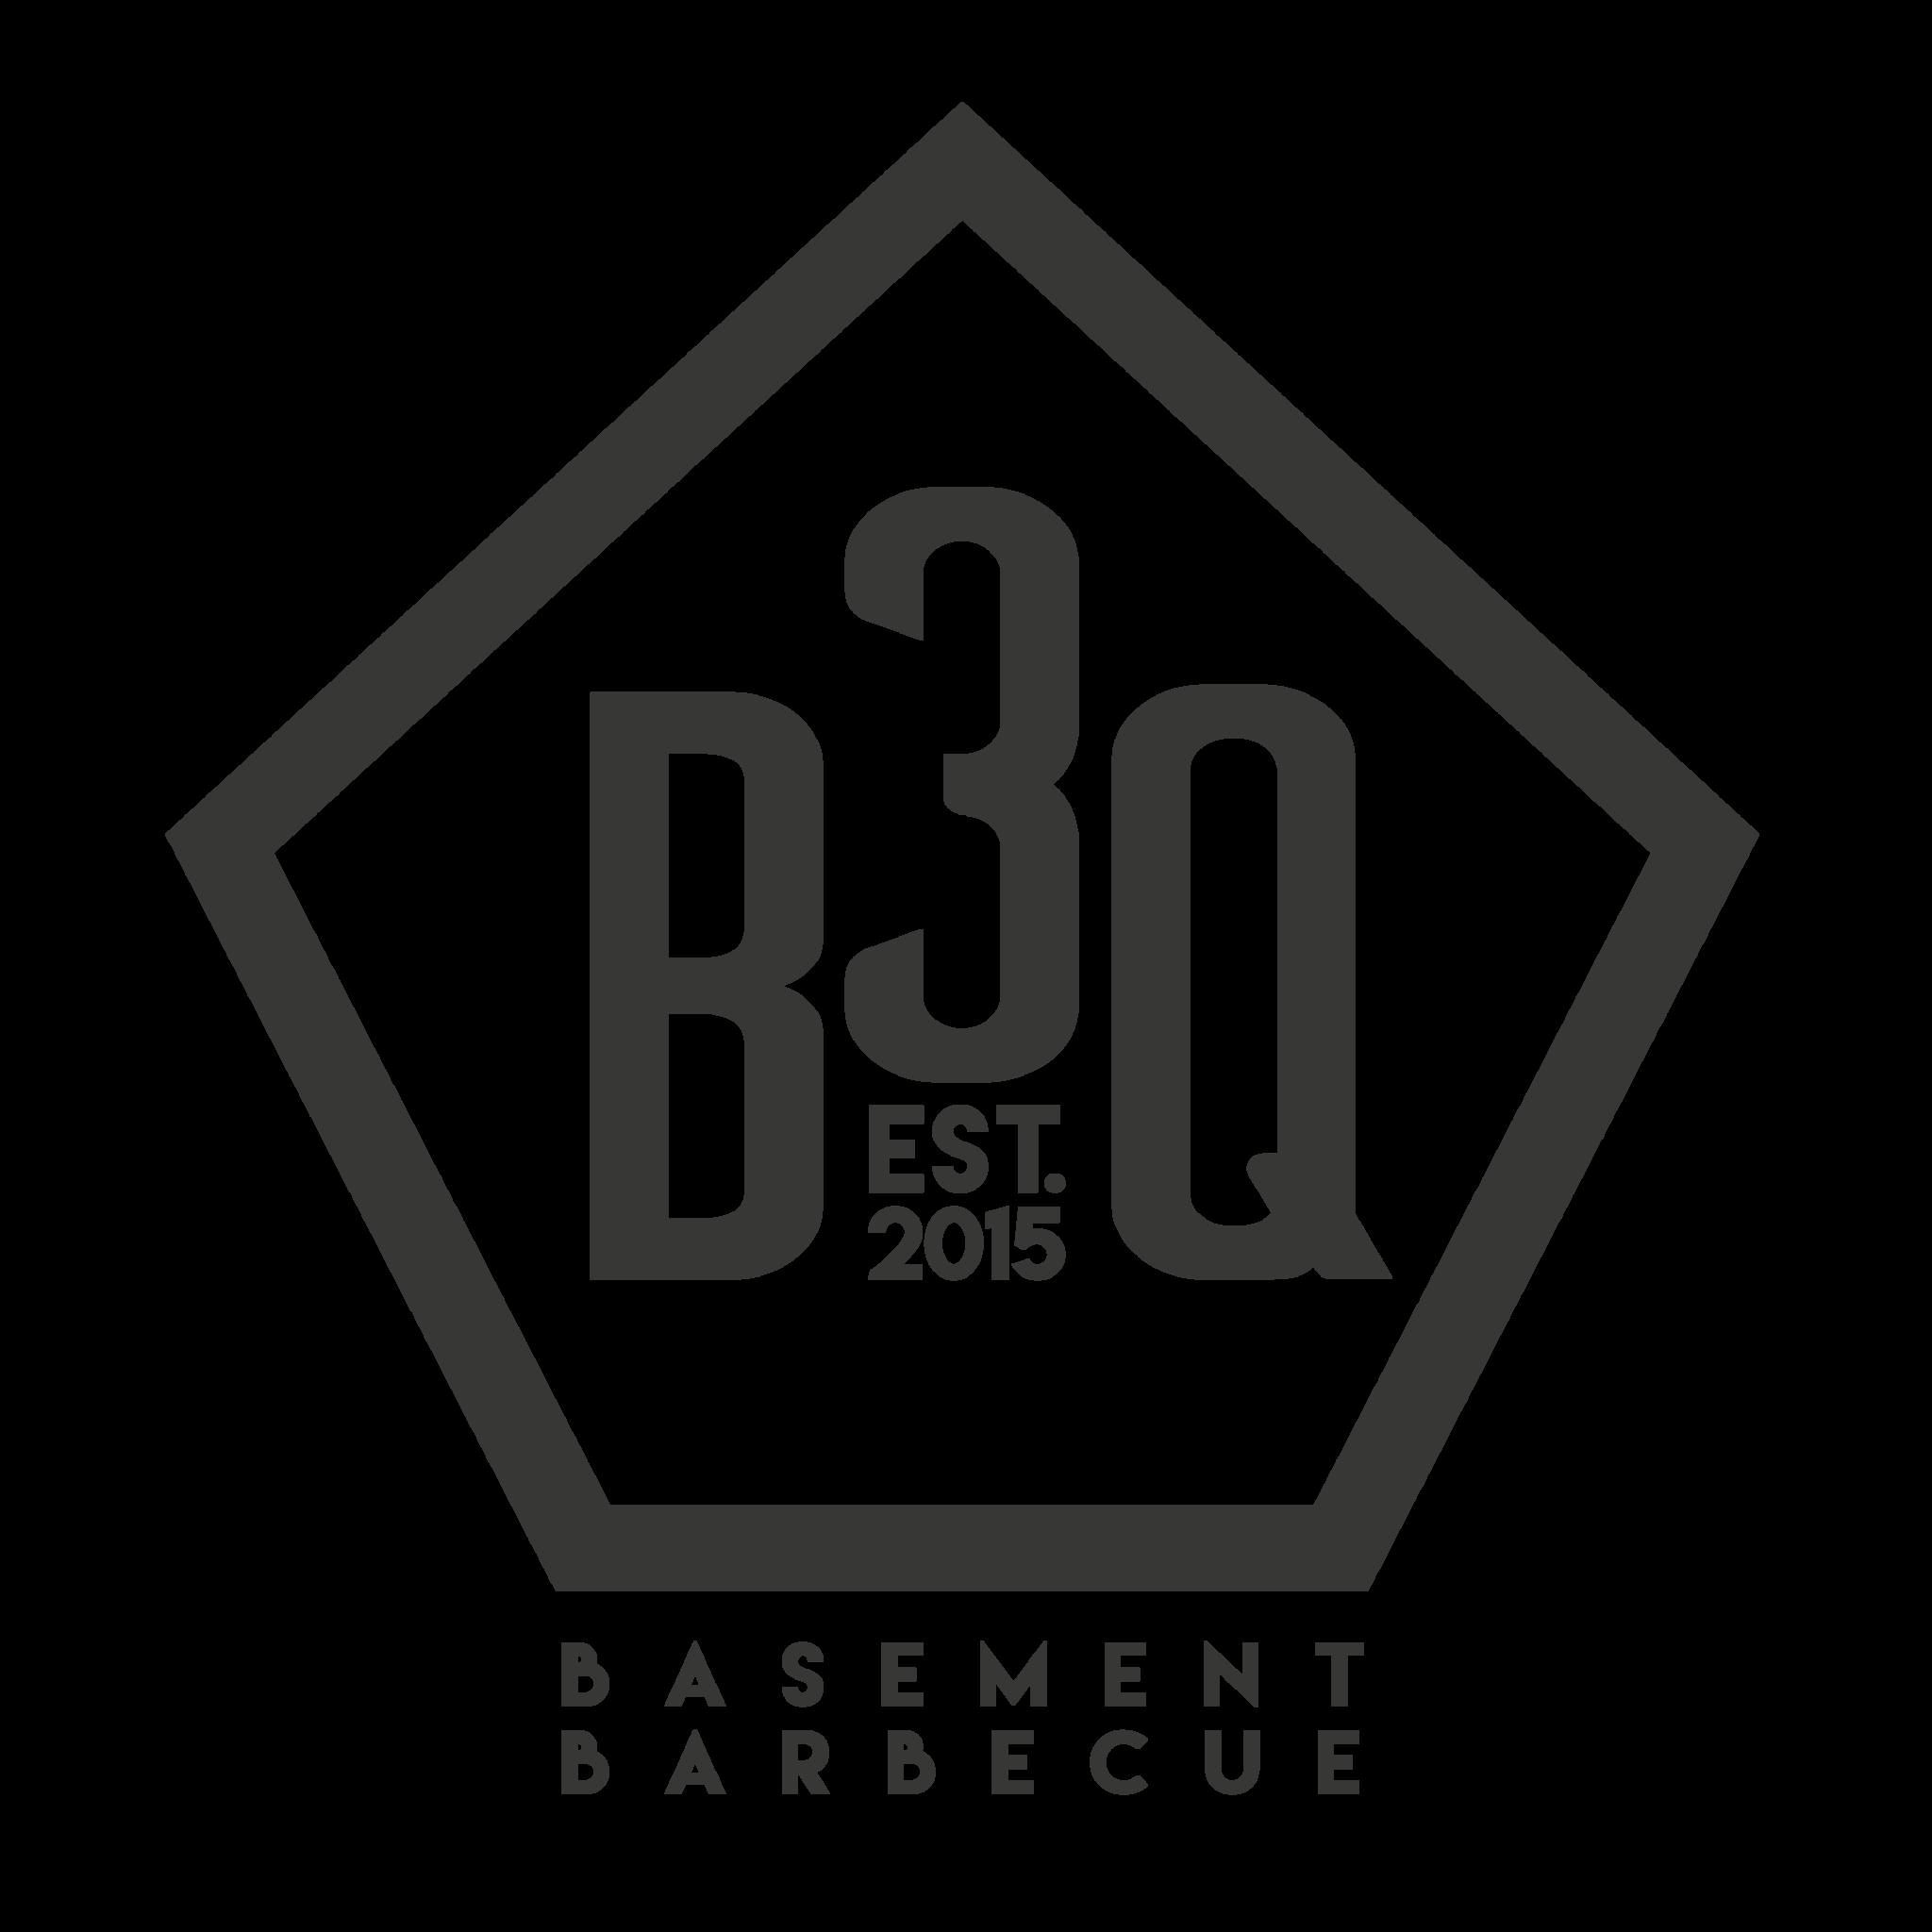 BasementBBQ- Partner Sydney & Frances